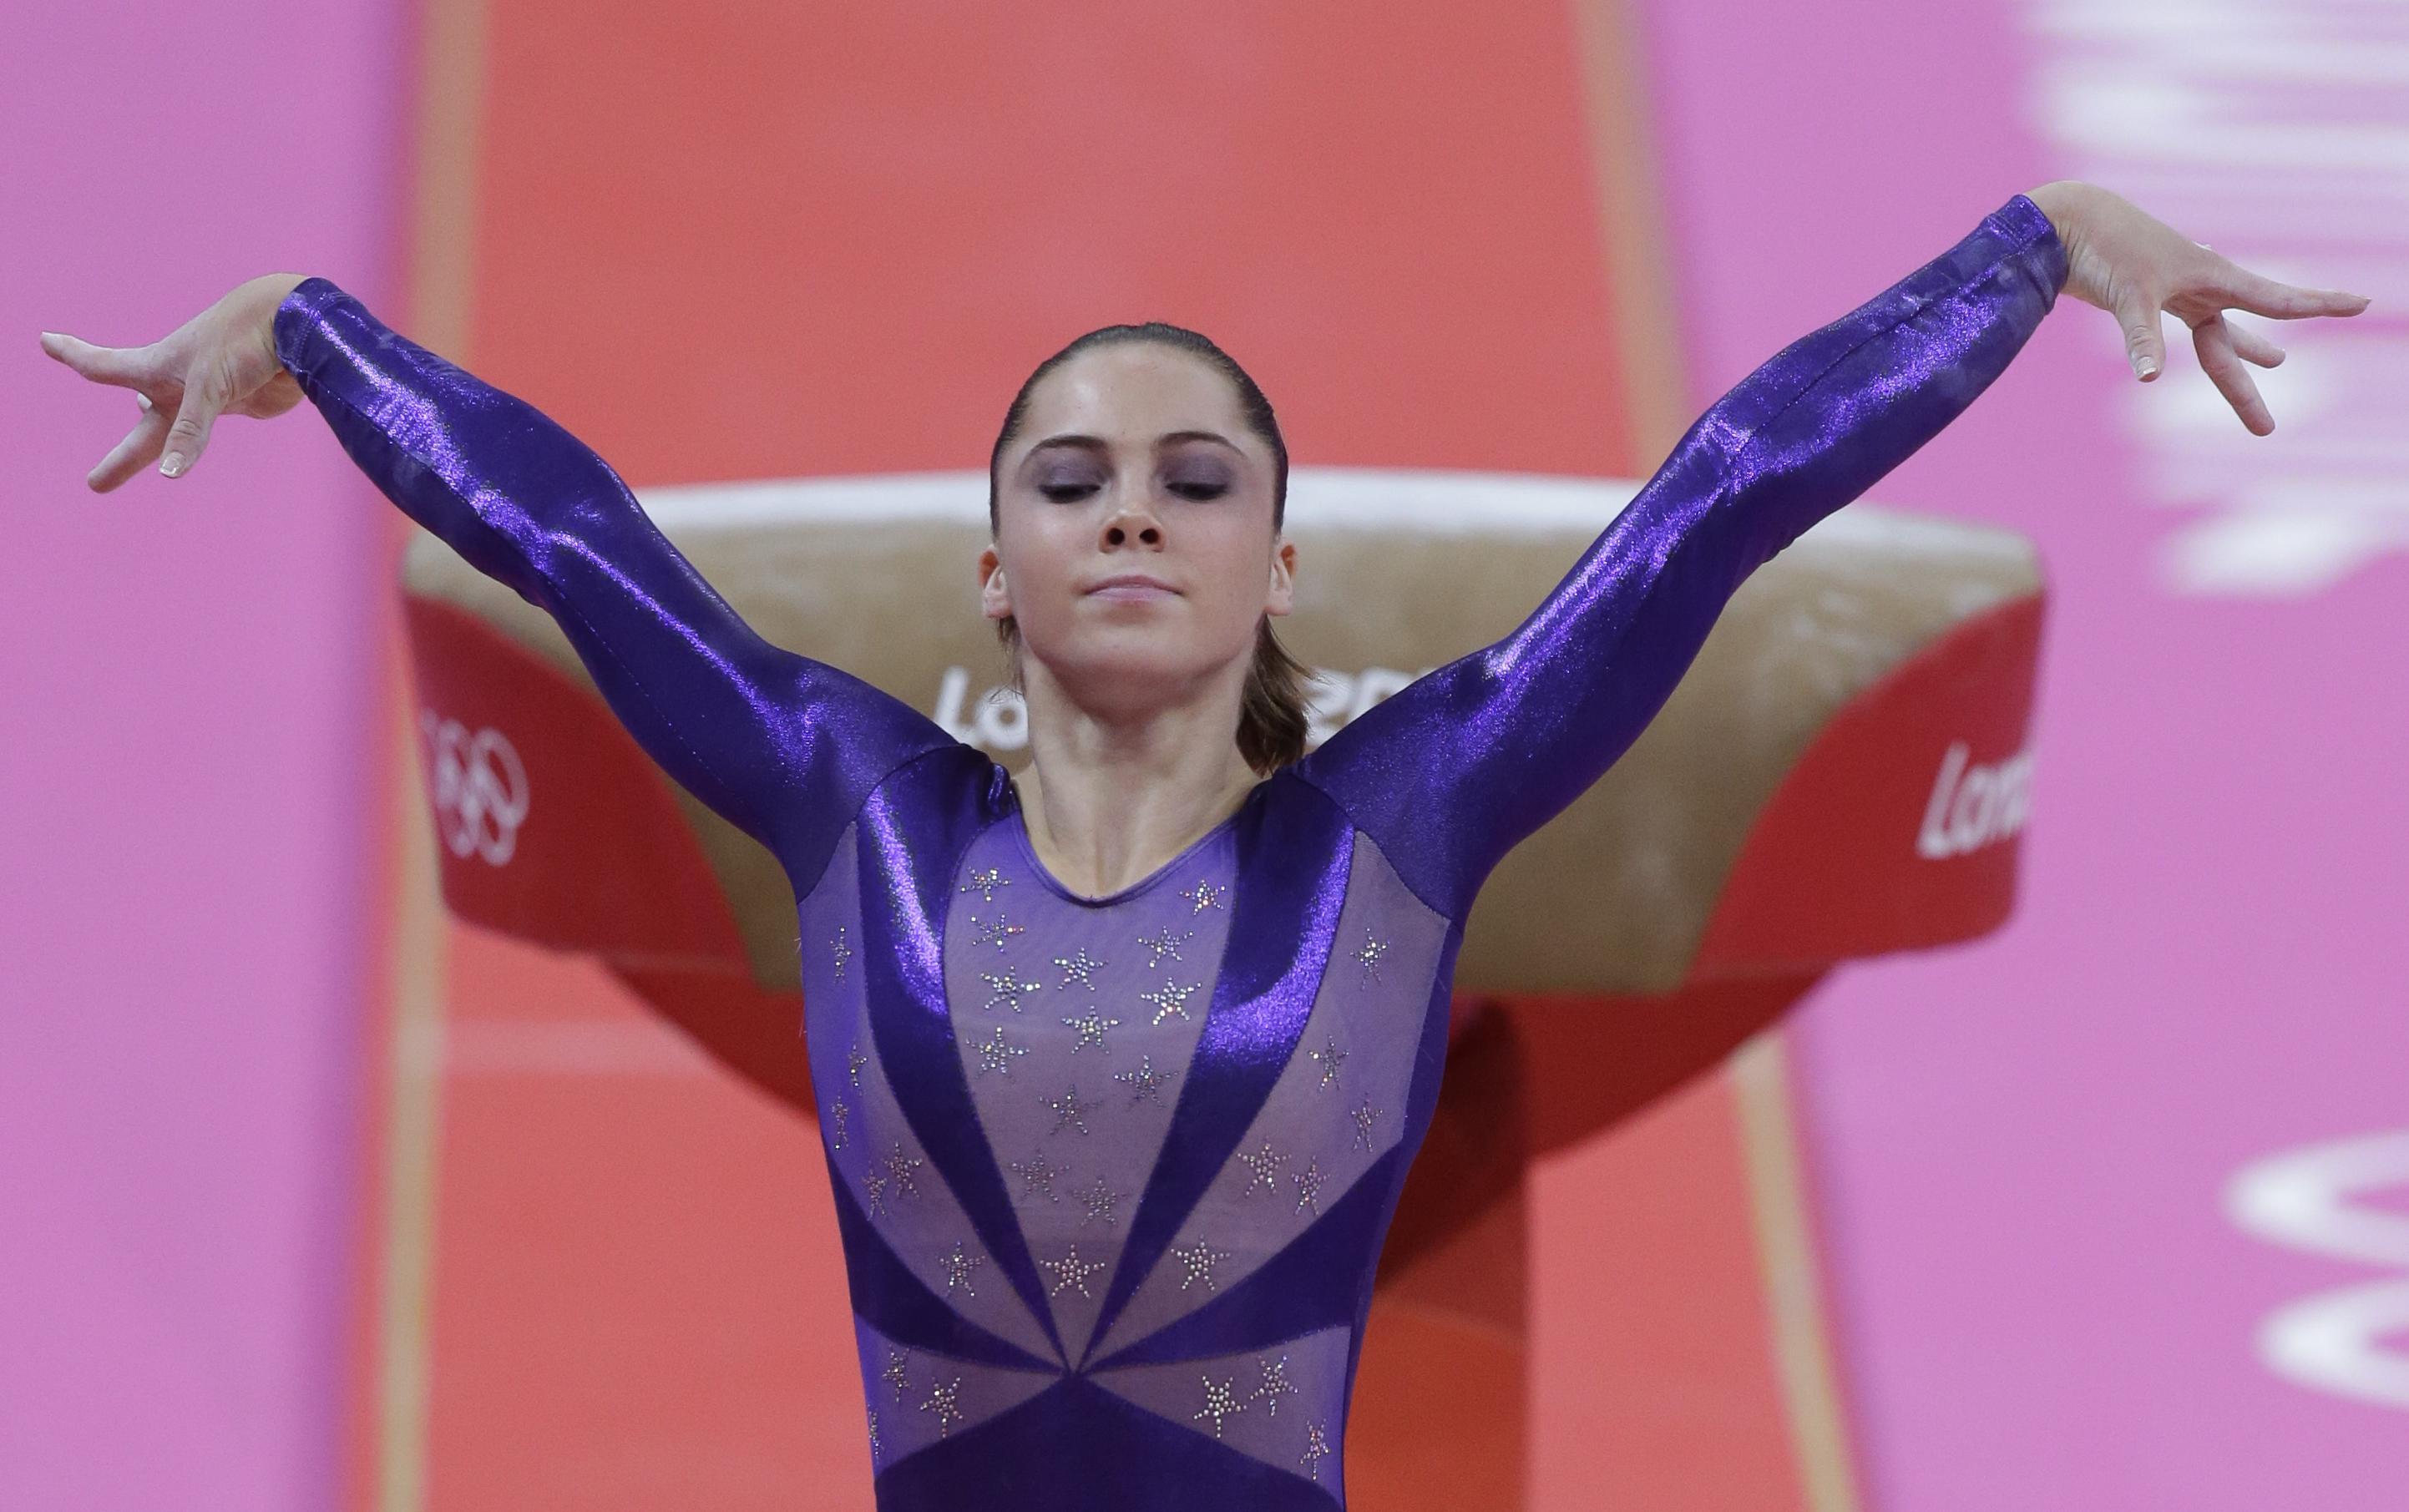 The Daily Dot on Twitter: Former USA gymnast McKayla